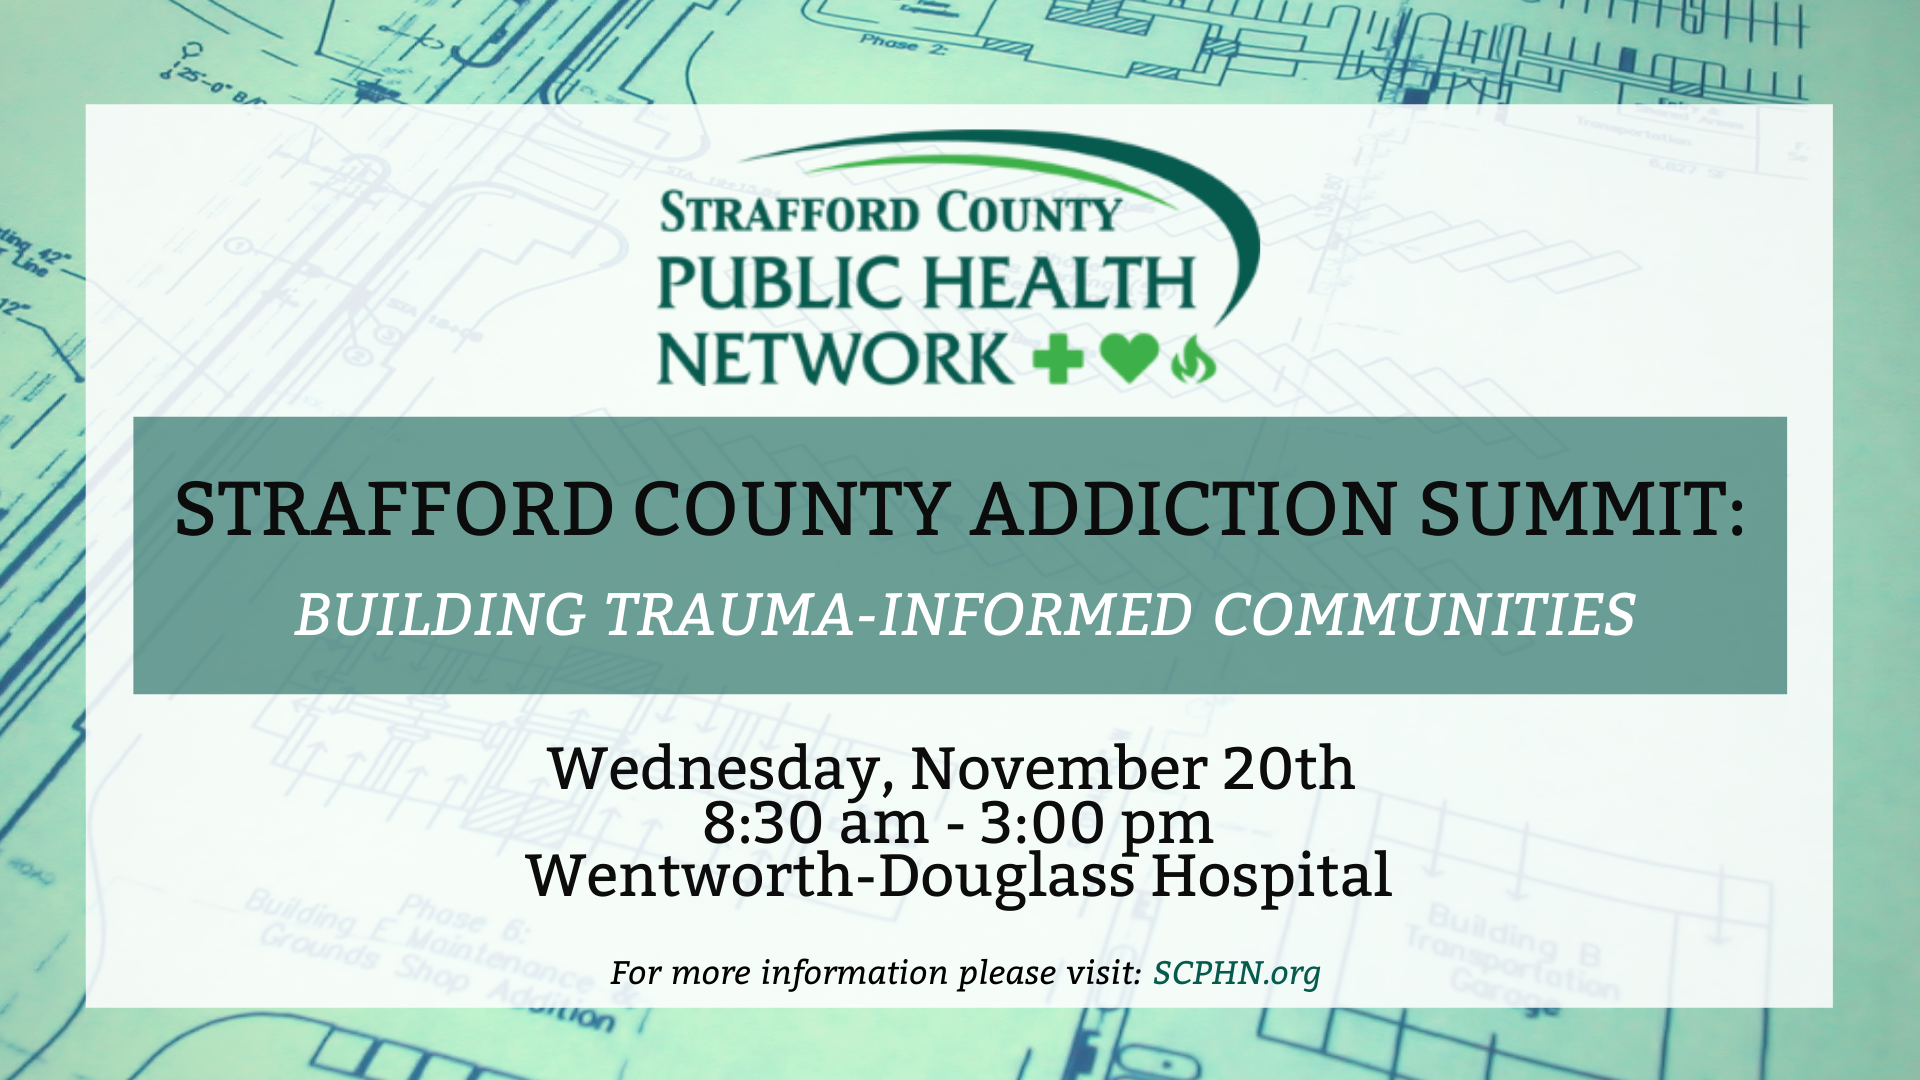 Strafford County Addiction Summit to focus on trauma-informed communities